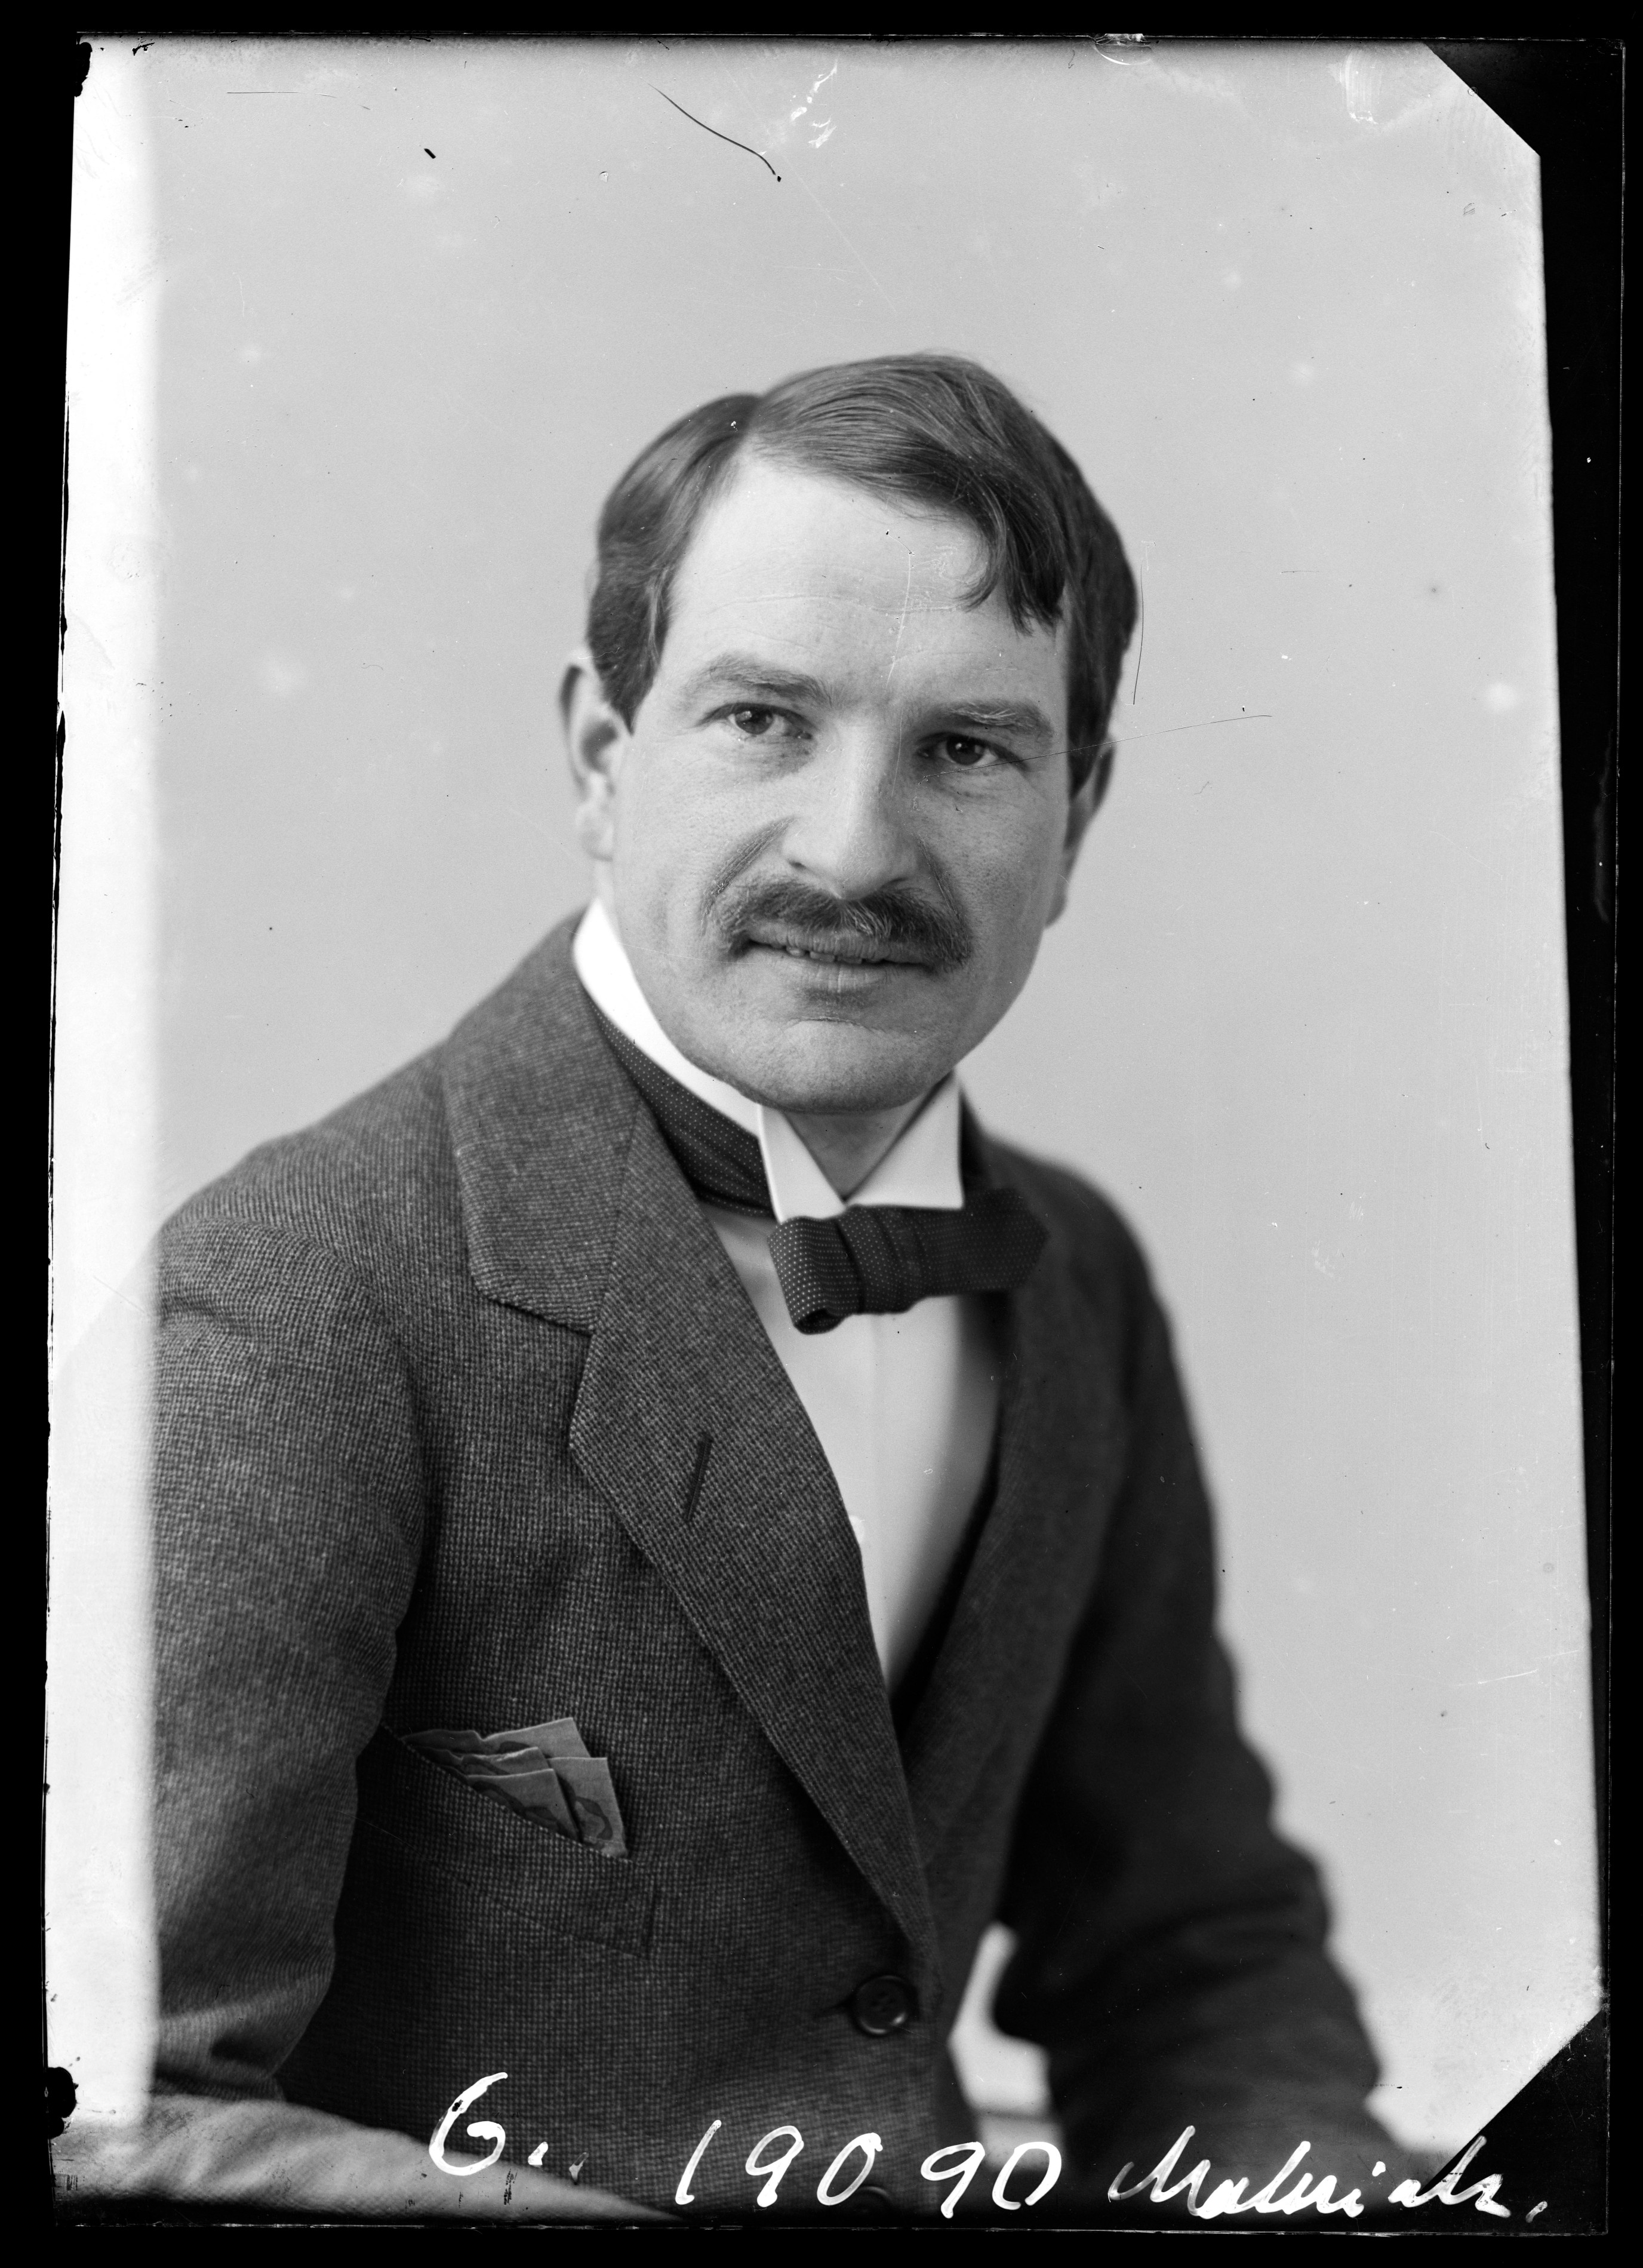 Portrettfoto av kapellmester Jan Maliniak, 1920